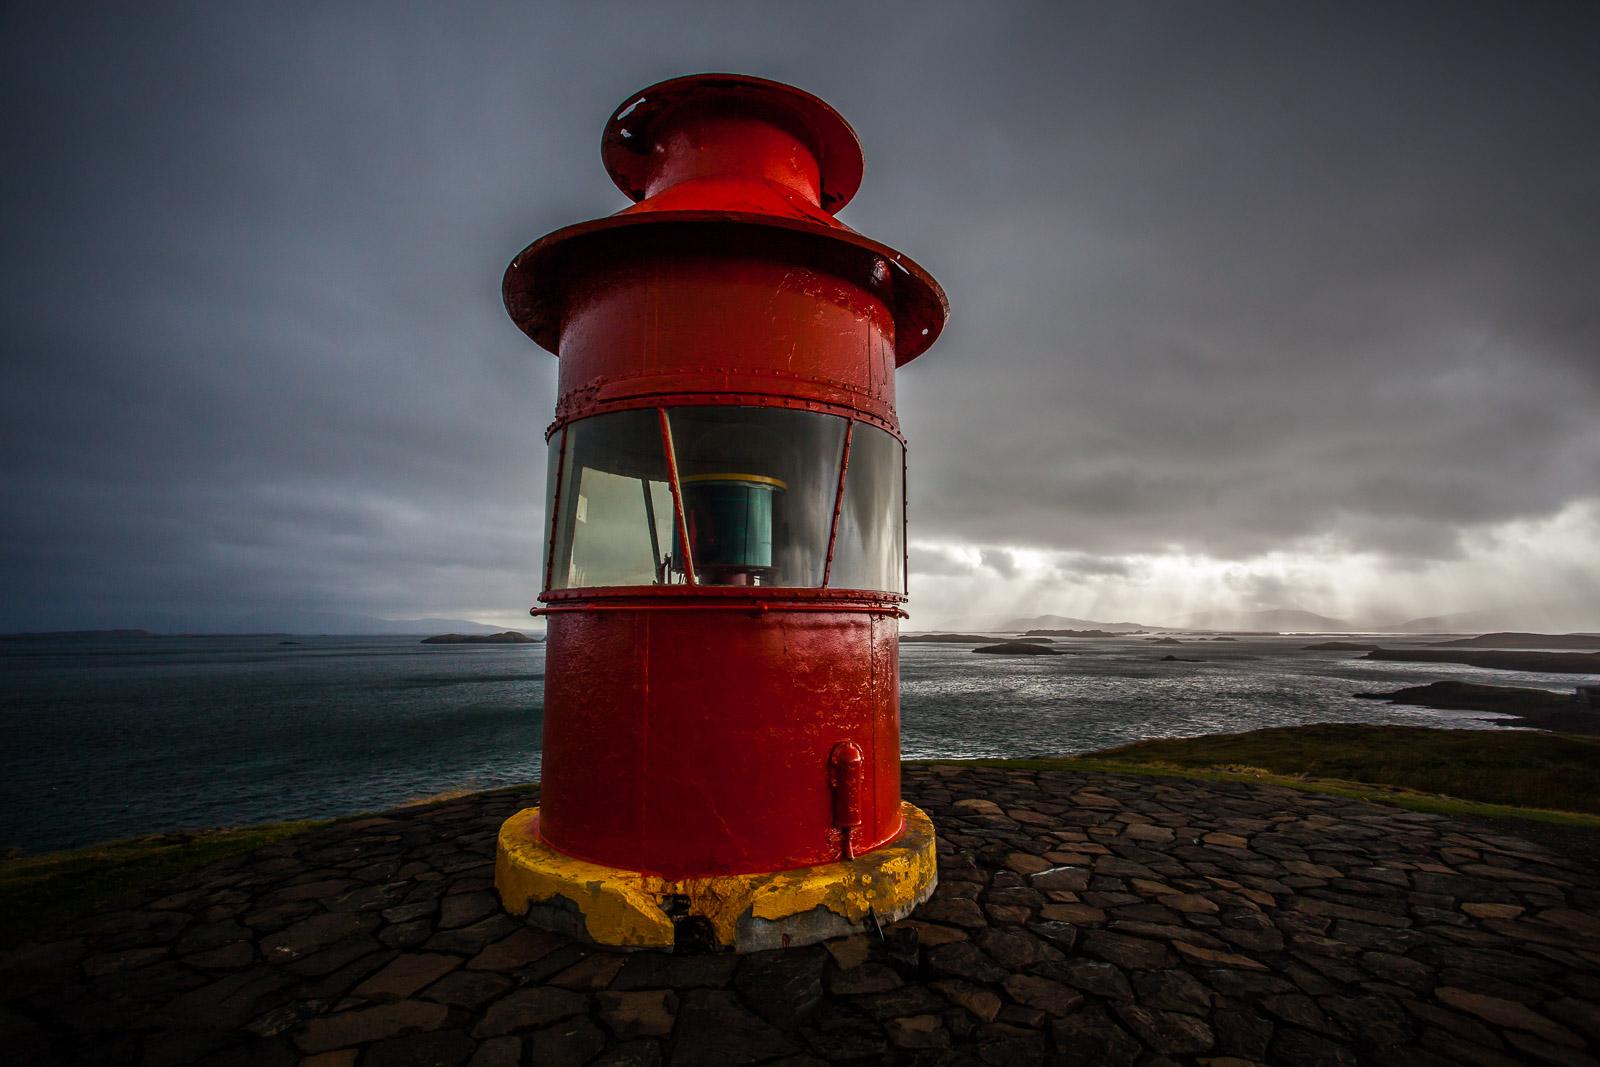 Iceland pt. 3